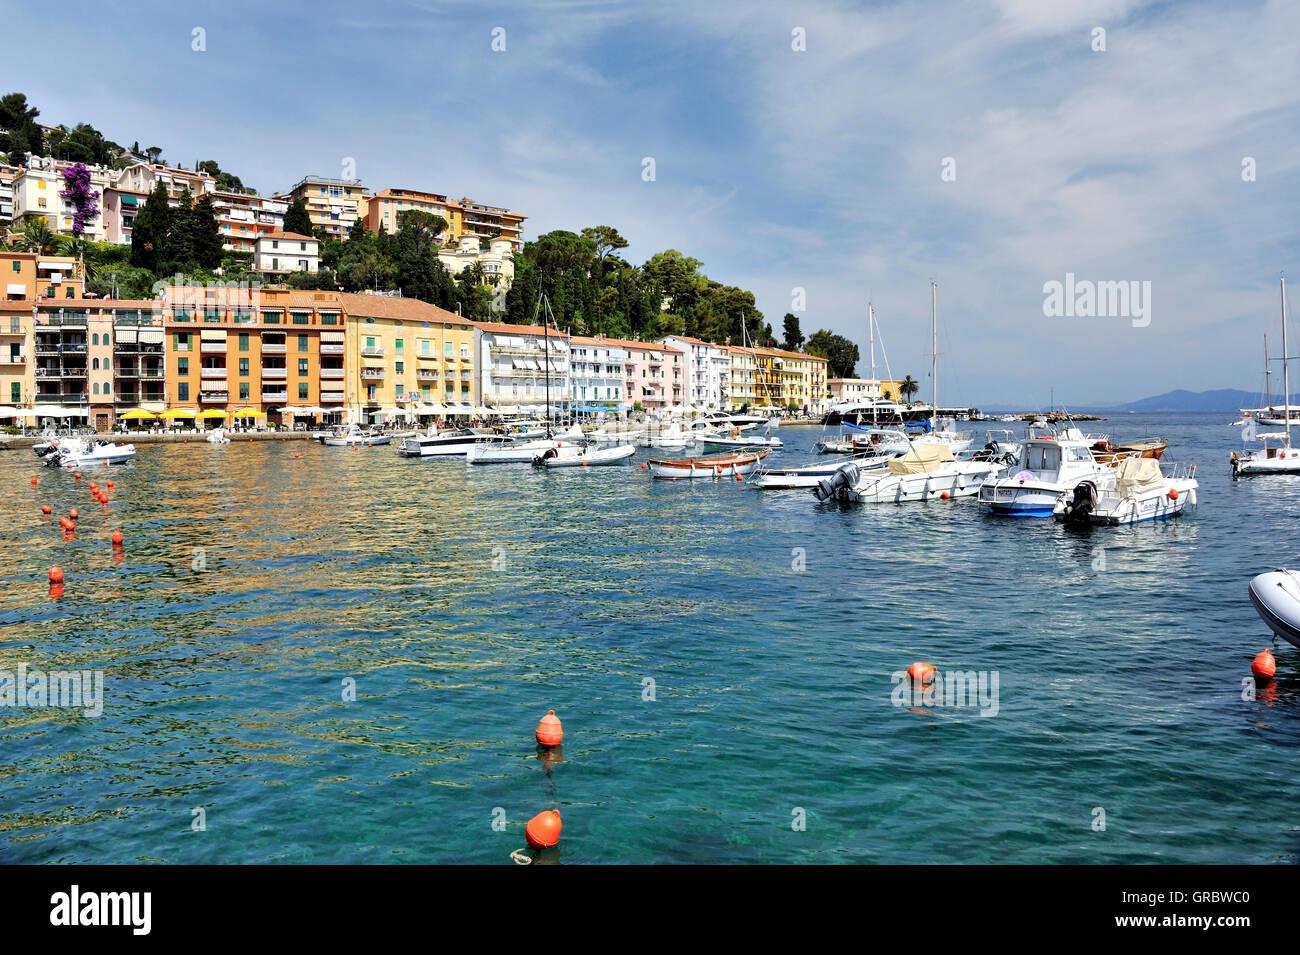 Costal Line Of Tuscan Town Porto Santo Stefano, Tuscany, Italy - Stock Image